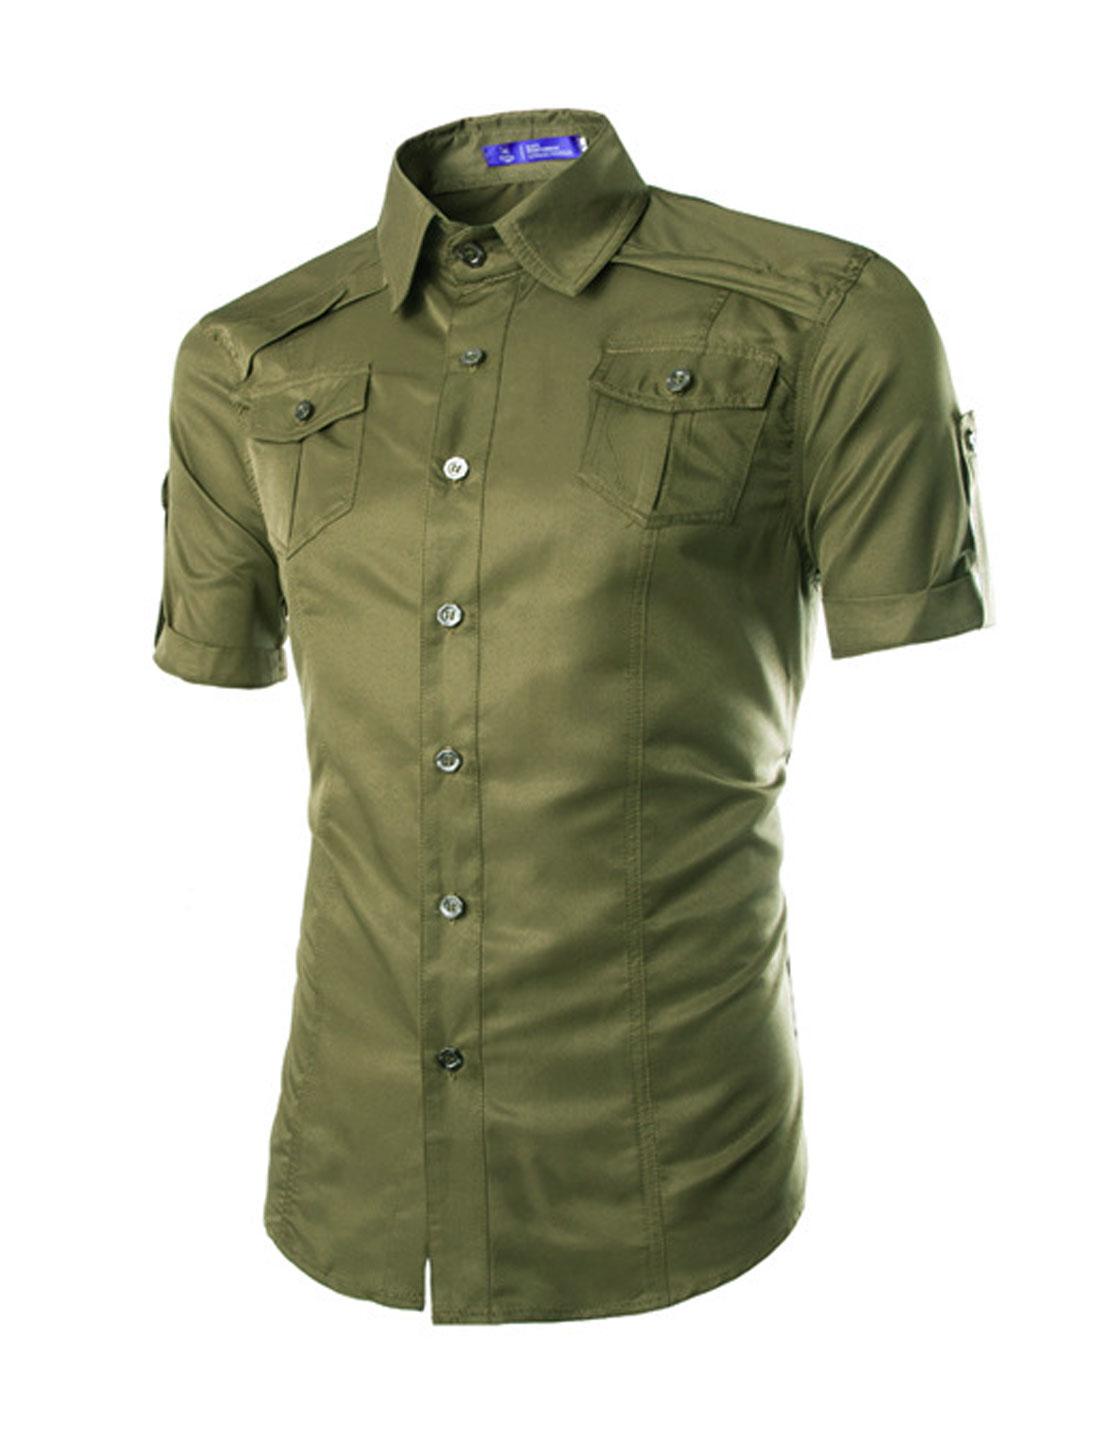 Men Point Collar Short Sleeves Round Hem Casual Shirts Army Green M